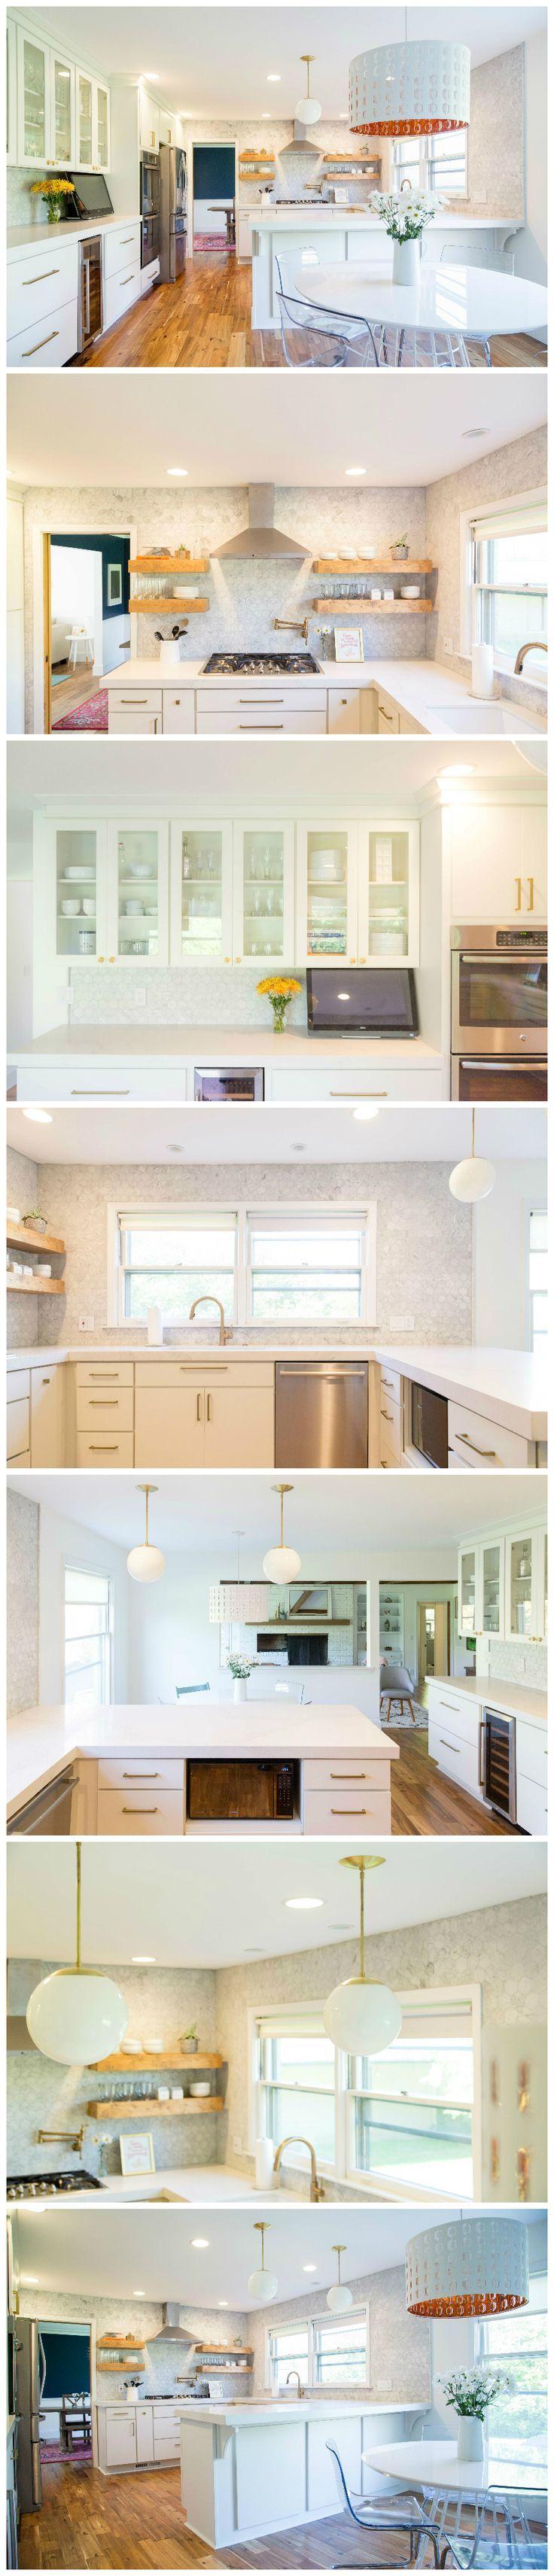 Bright White Kitchen Remodel Renovating The Kitchen How To Renovate Your Kitchen Kitchen